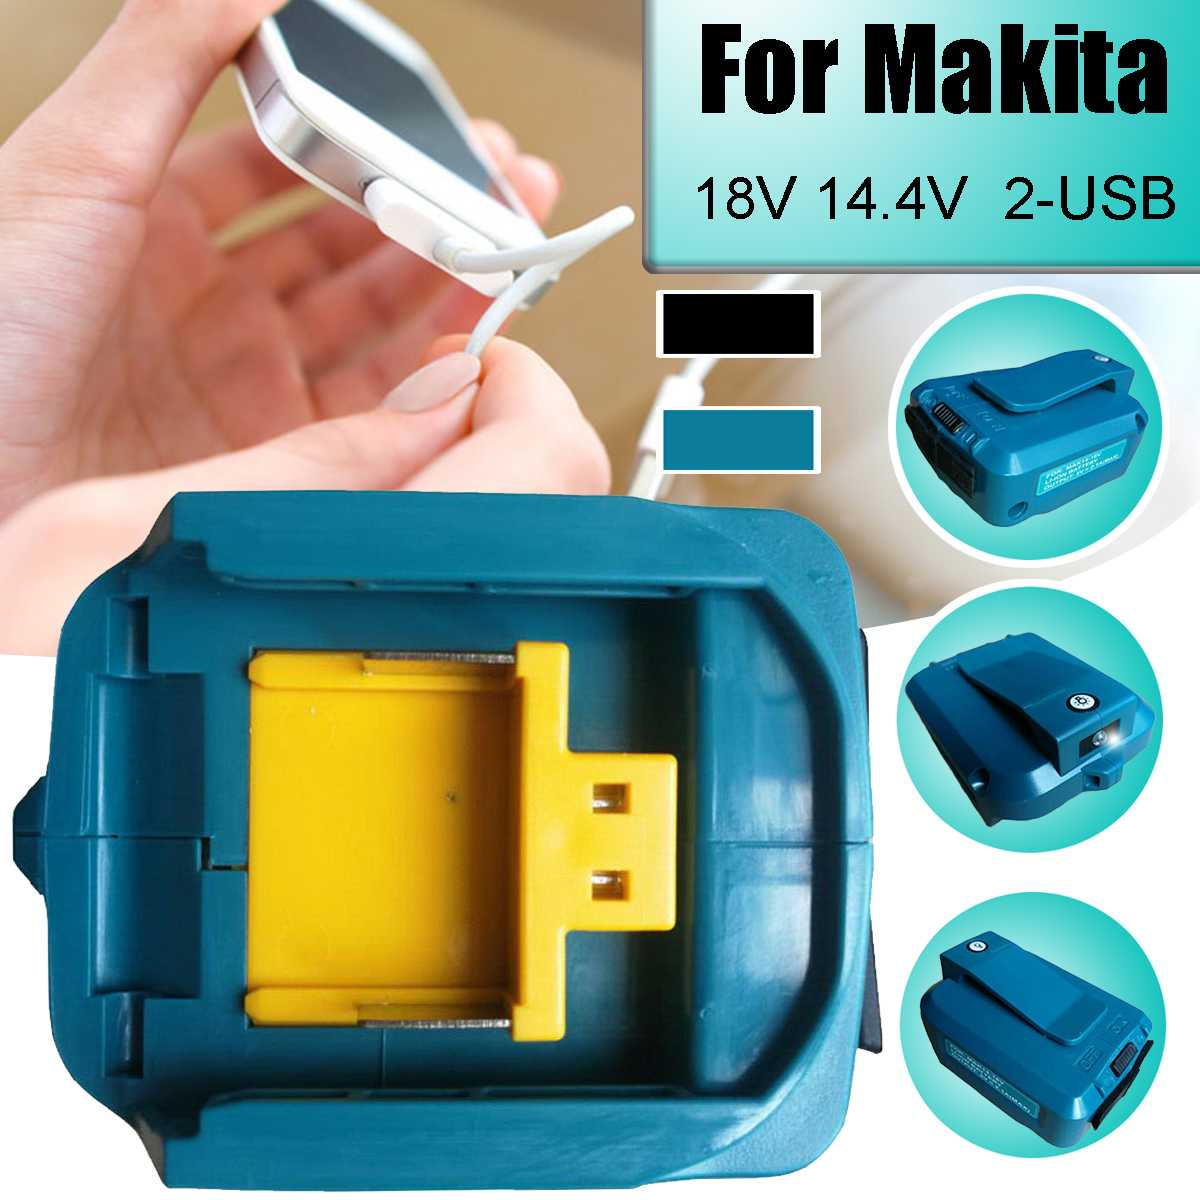 Portable USB Charging Adapter 2-USB For Makita Tools Charging Battery Adapter Power Charger For Mobile Phone Power Tool Battery